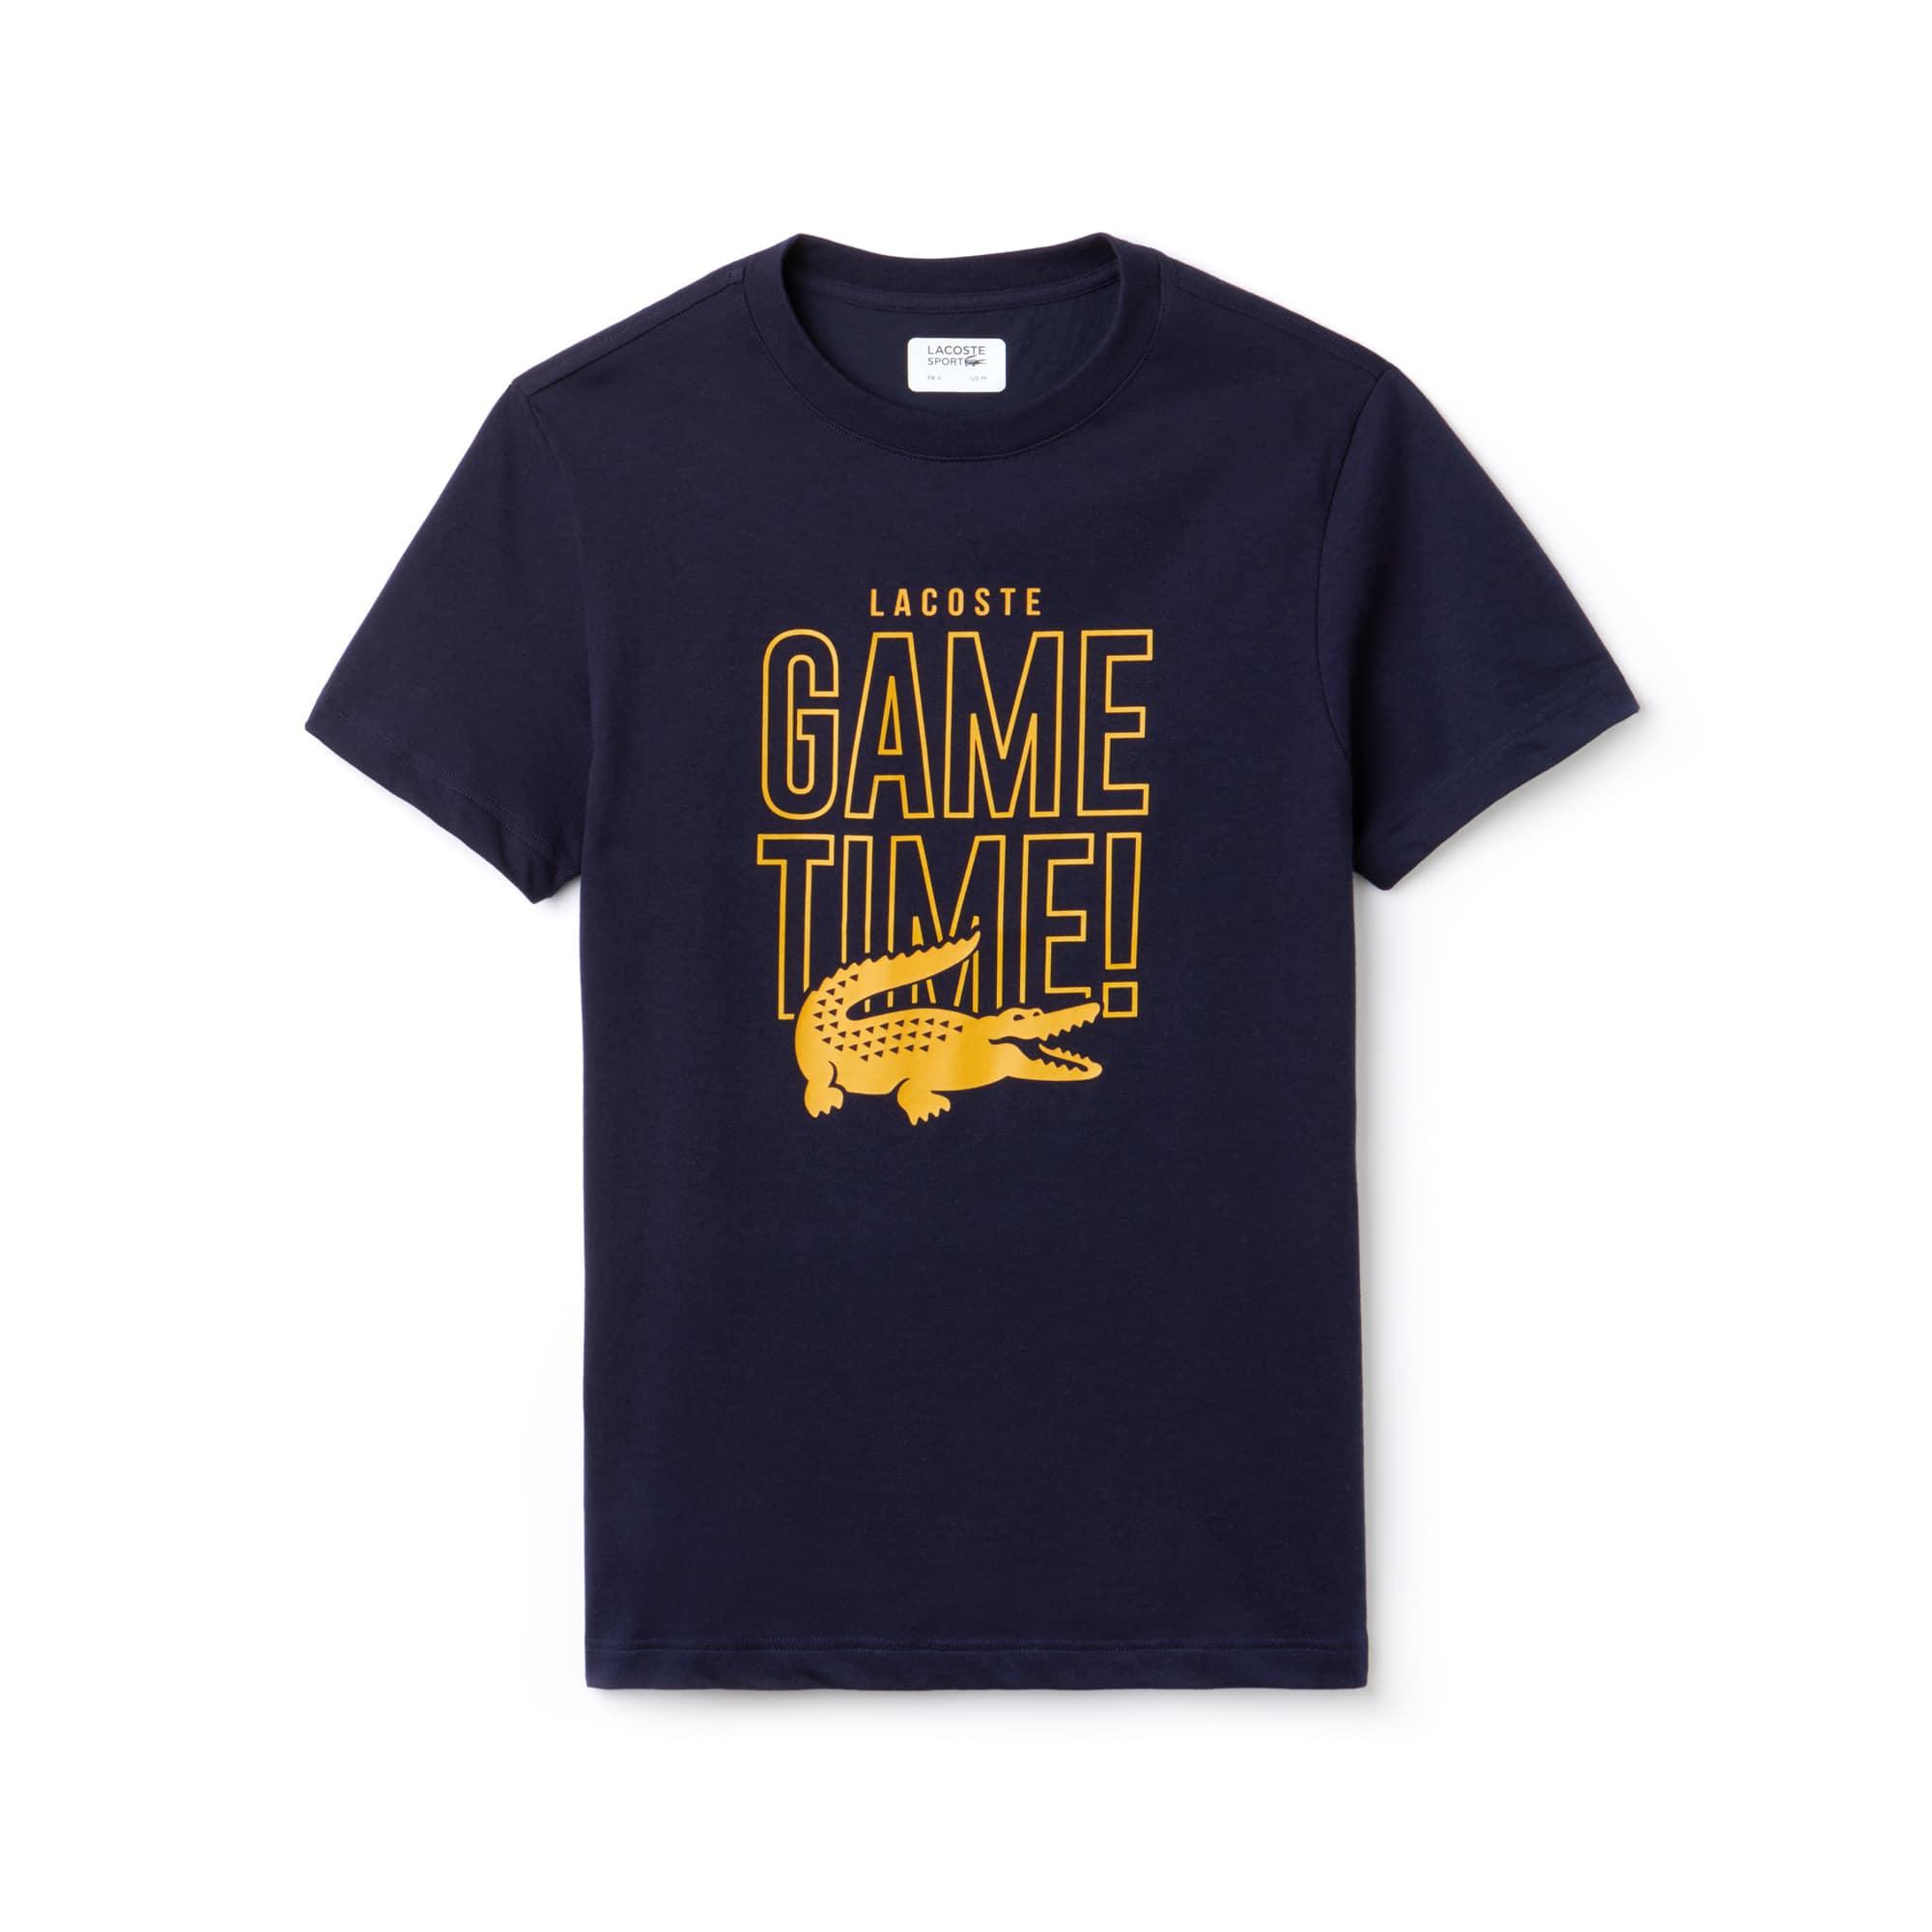 Lacoste SPORT Game Time Tennis-T-shirt heren jersey ronde hals